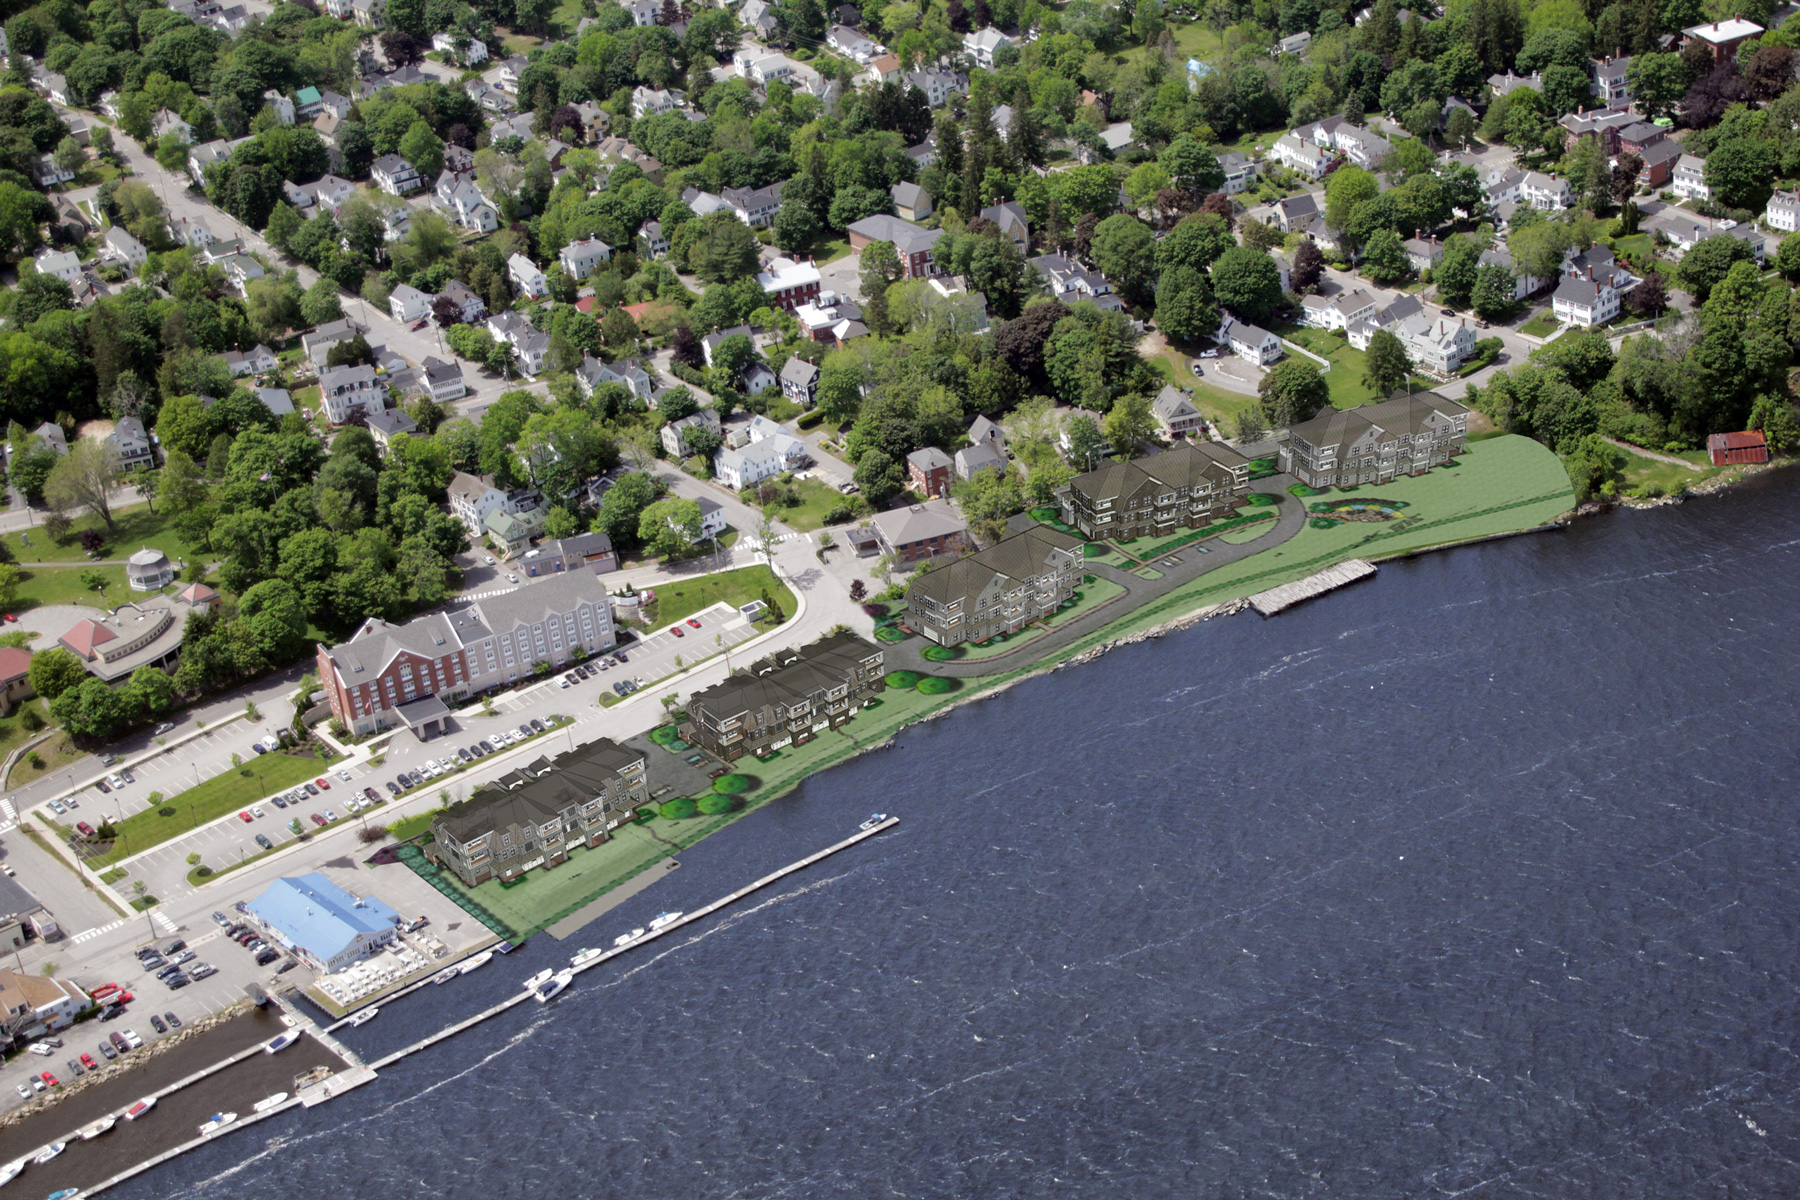 Condominium for Sale at 145 Commercial Street, # 201 Bath, Maine, 04530 United States